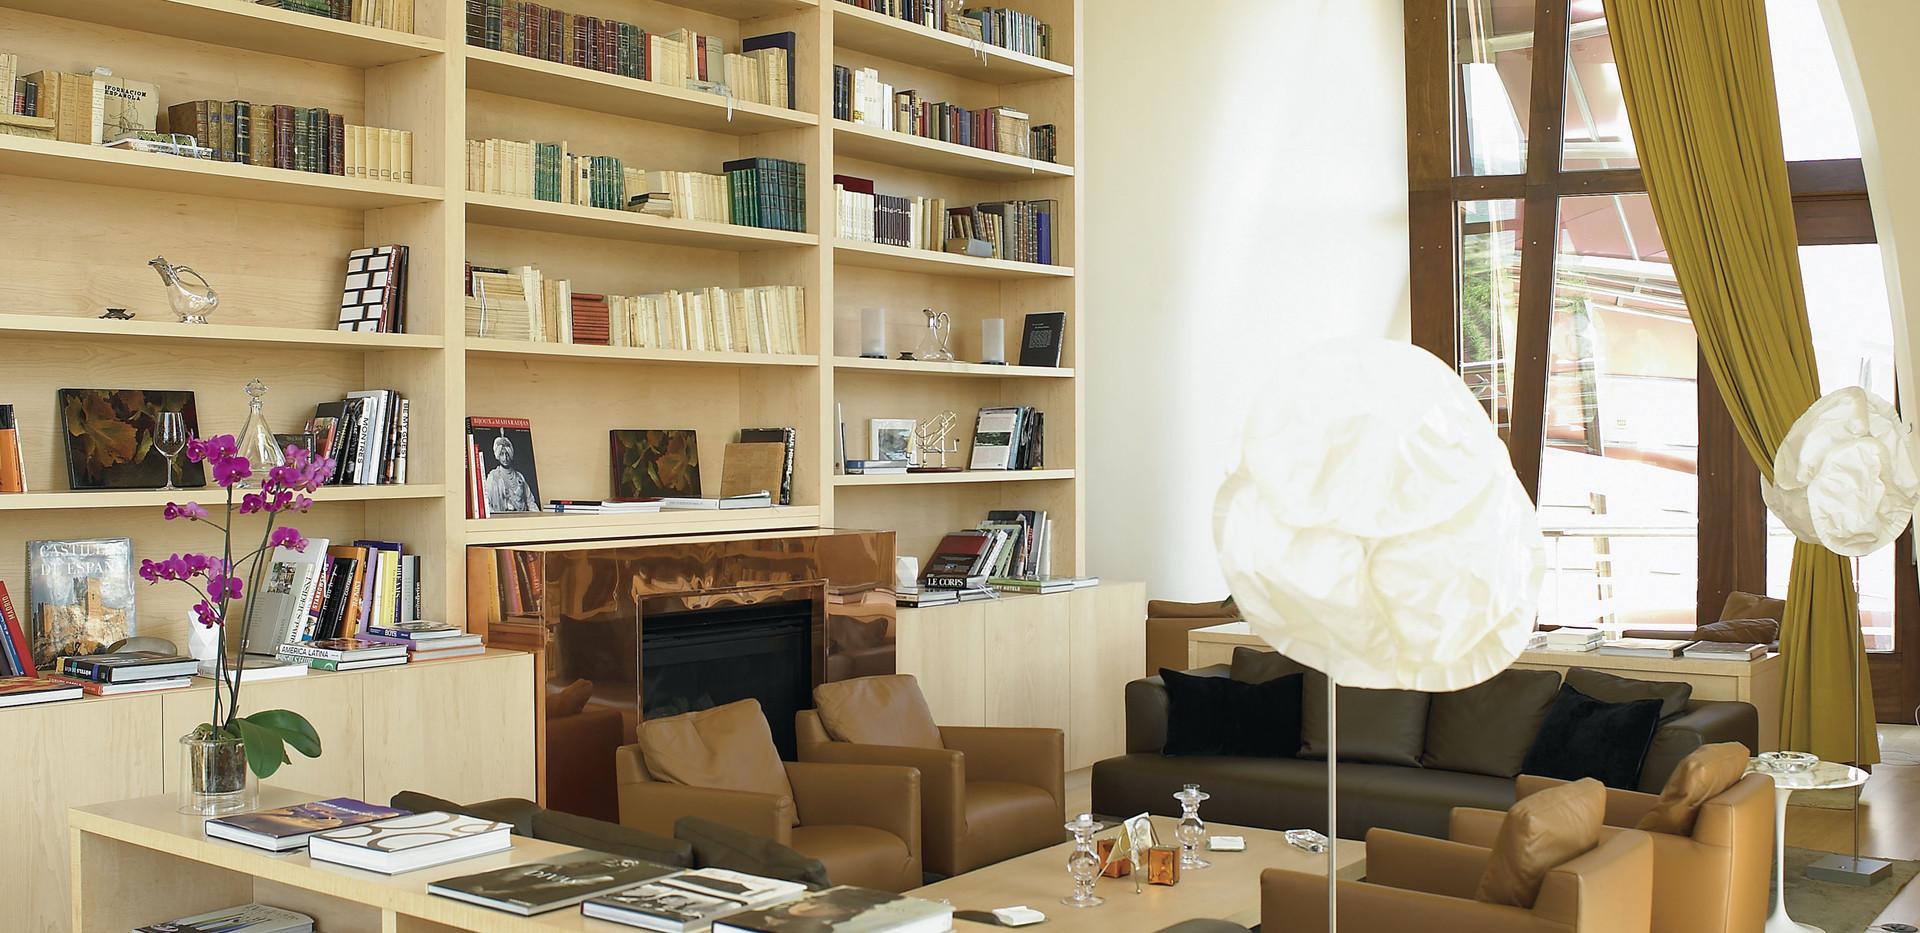 HotelMarquesDeRiscal-FrankGehry-CesarCai